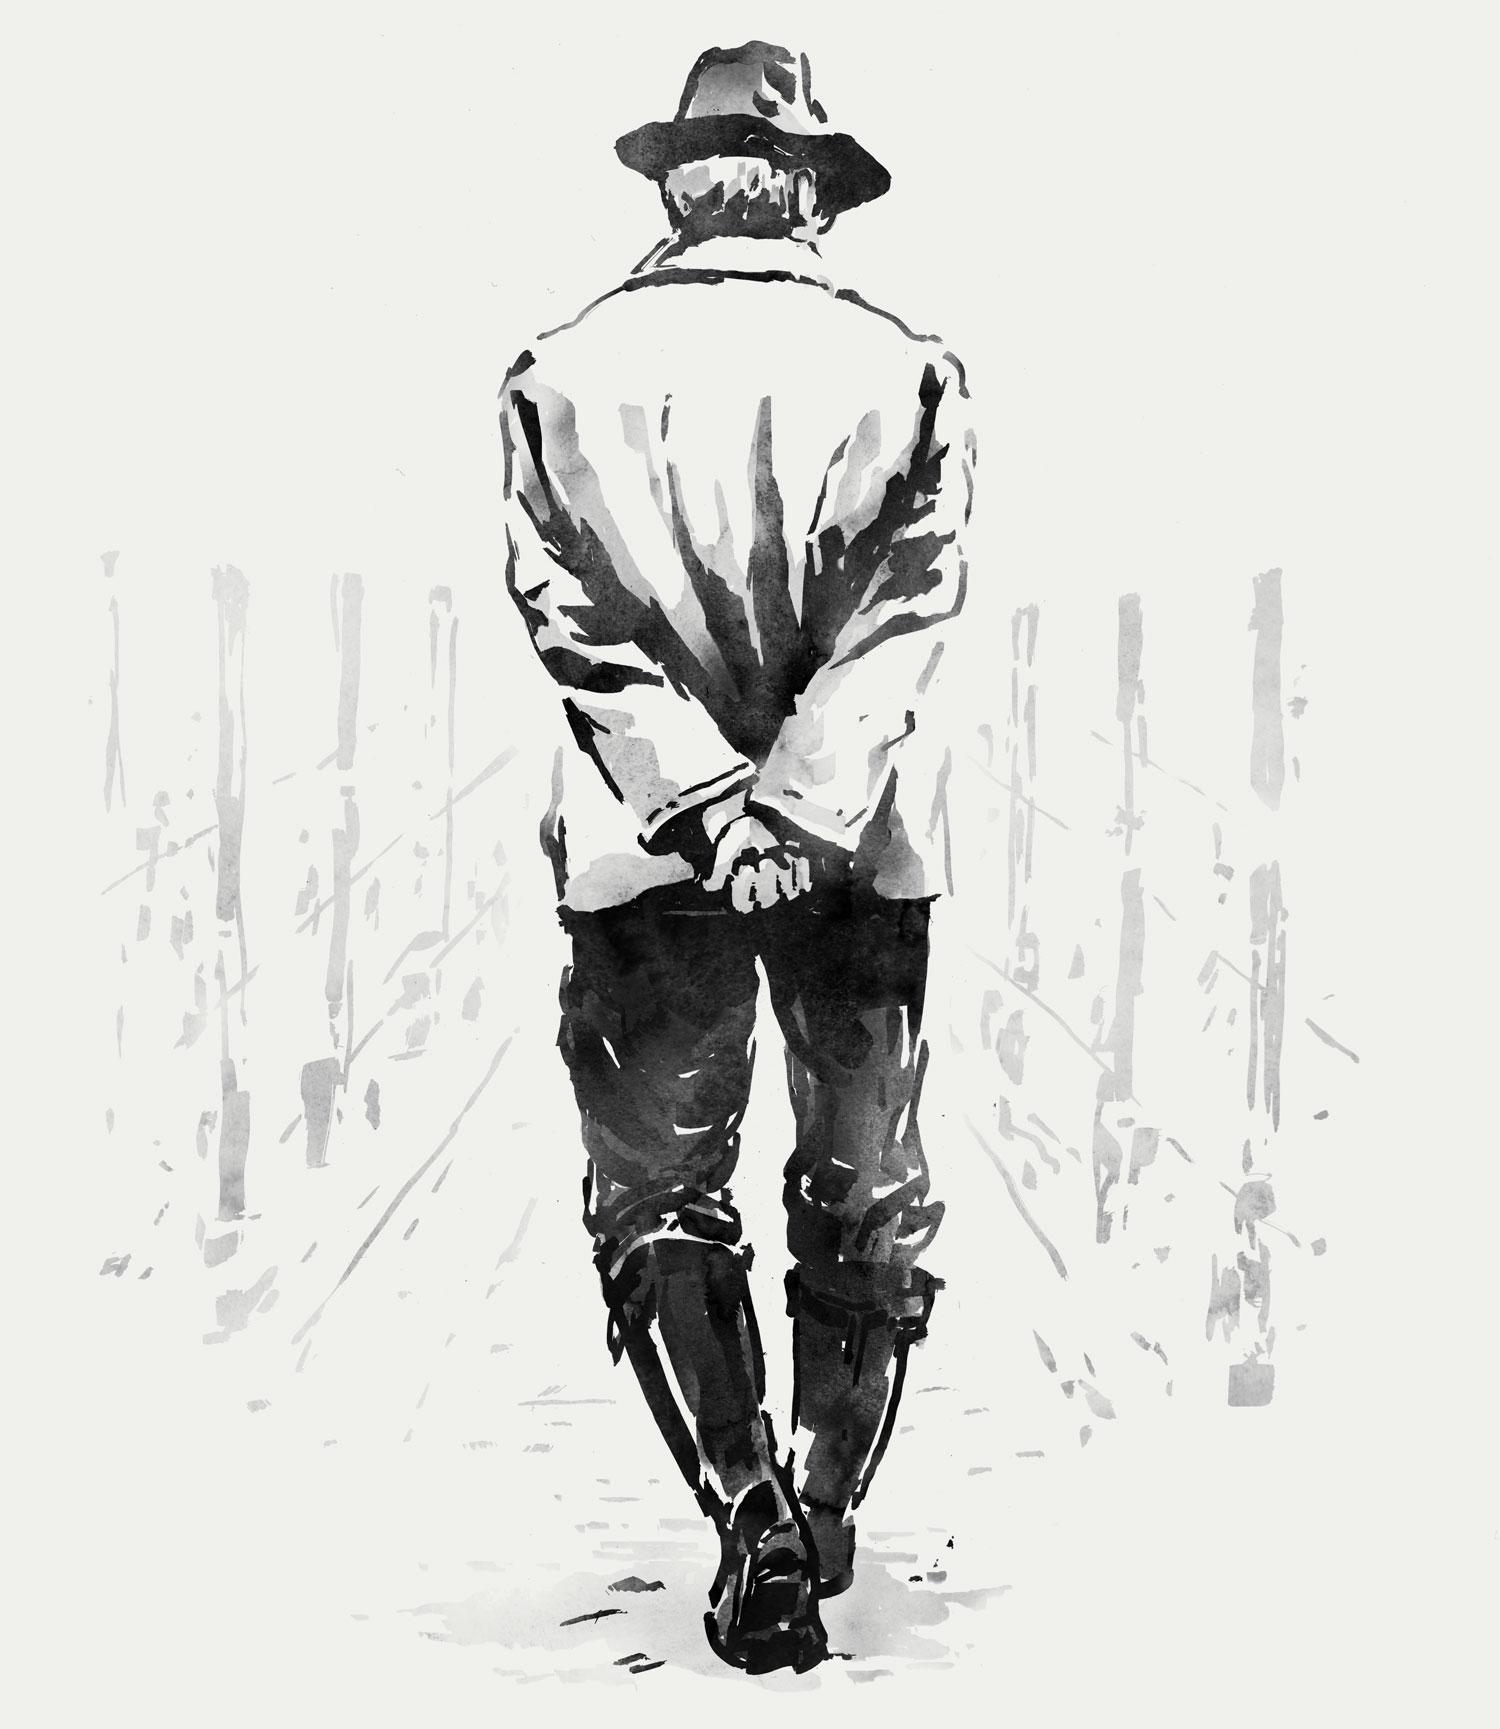 Gentleman farmer winemaker illustration